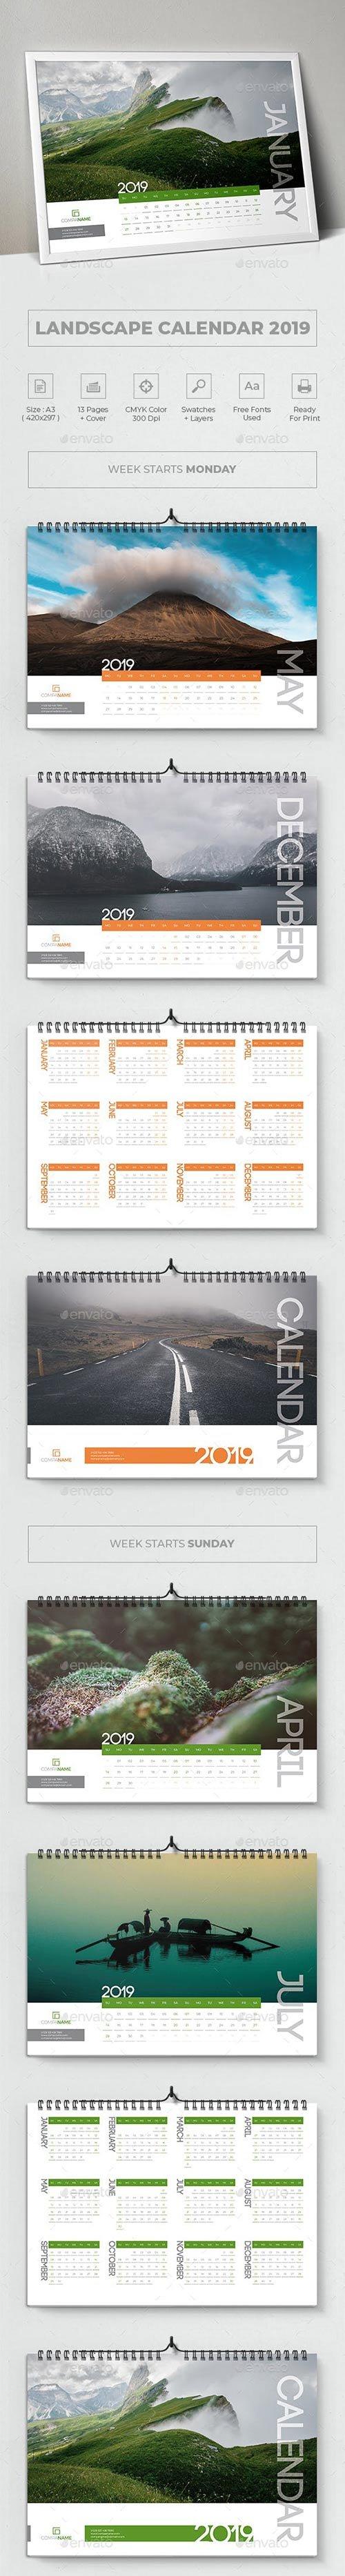 GraphicRiver - Landscape Calendar 2019 22783301